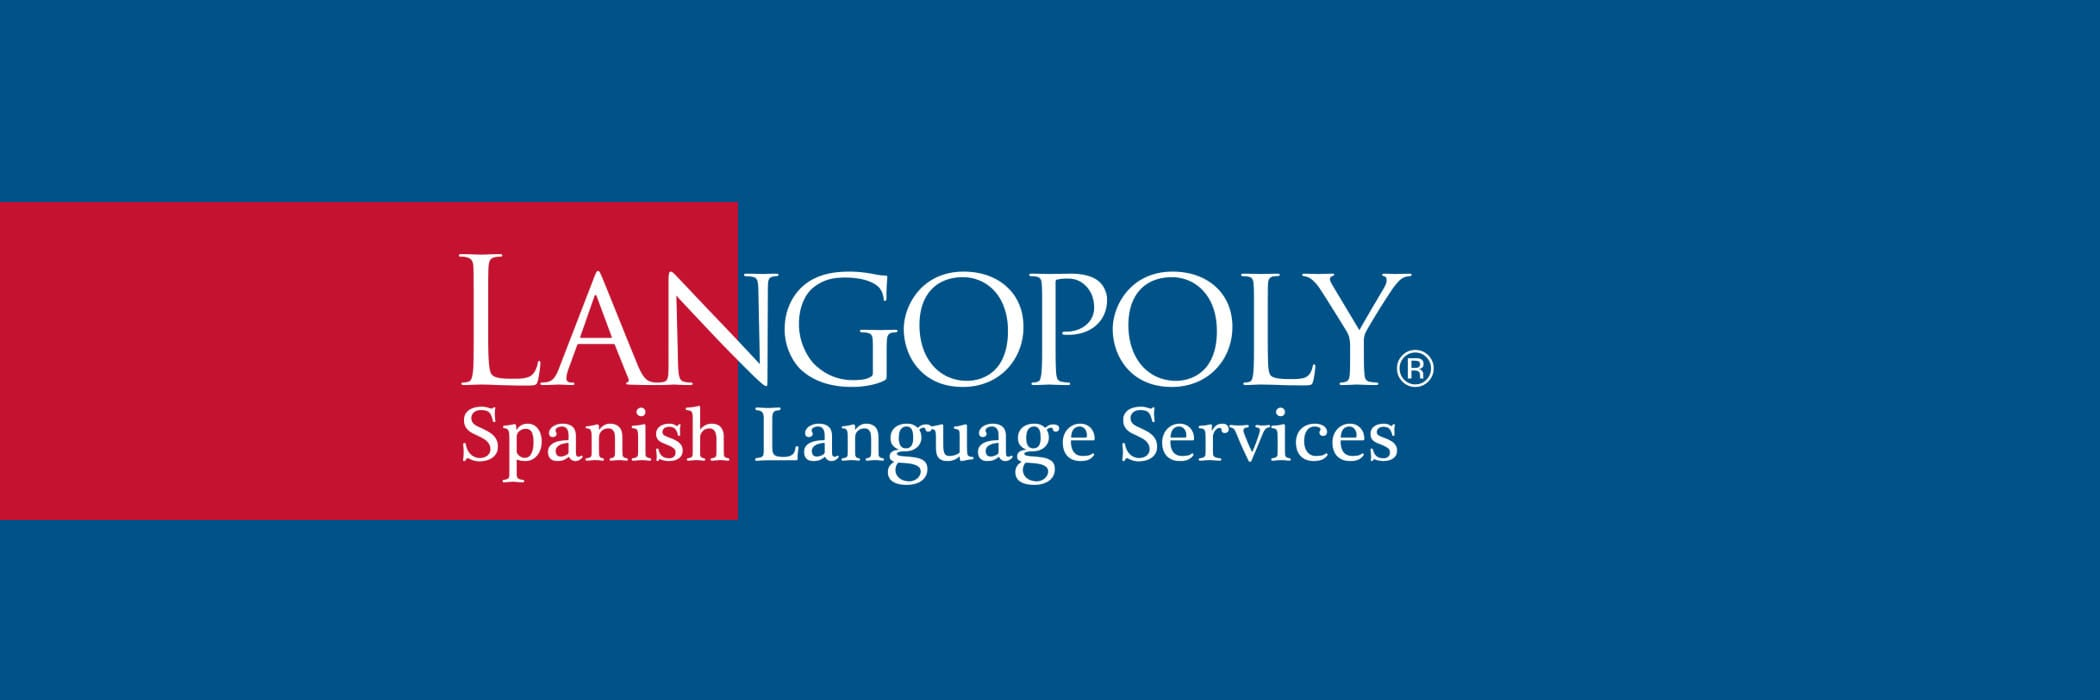 Langopoly